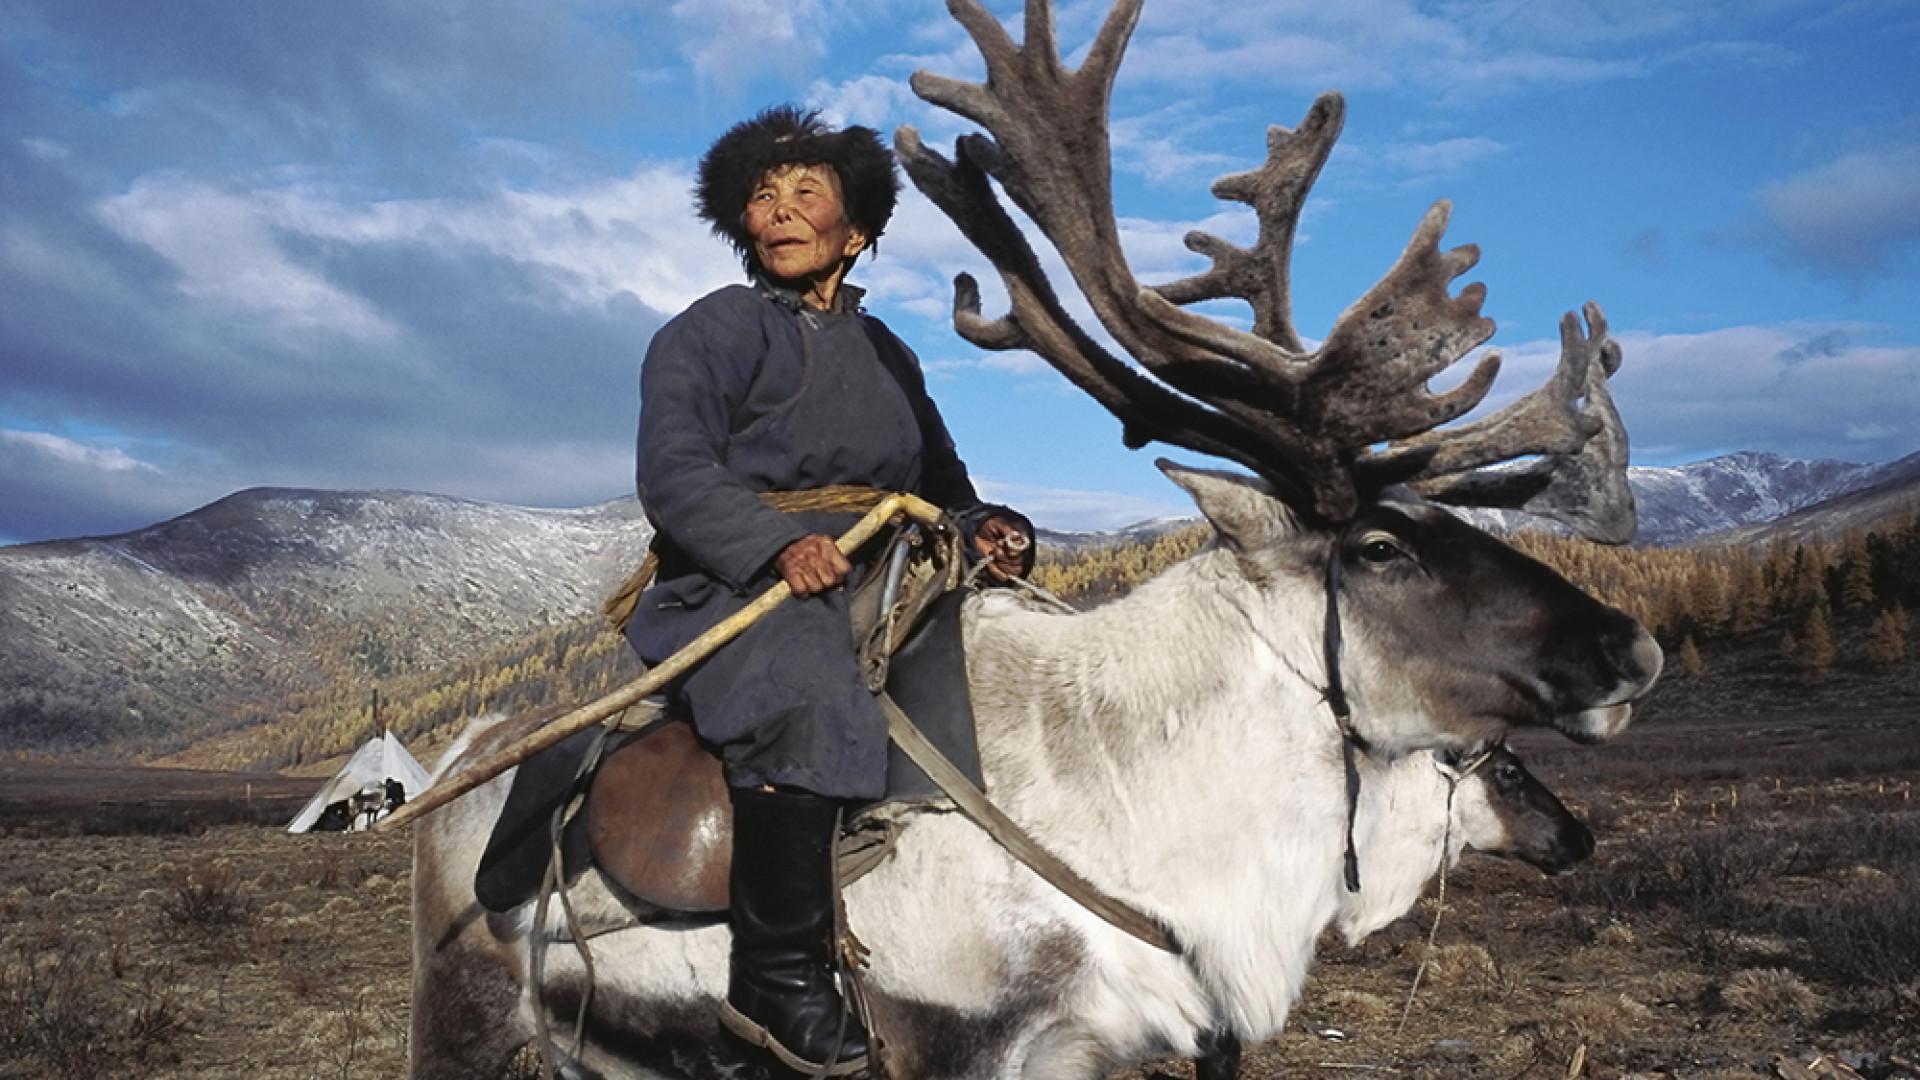 Shaman matriarch in West Taiga, Mongolia